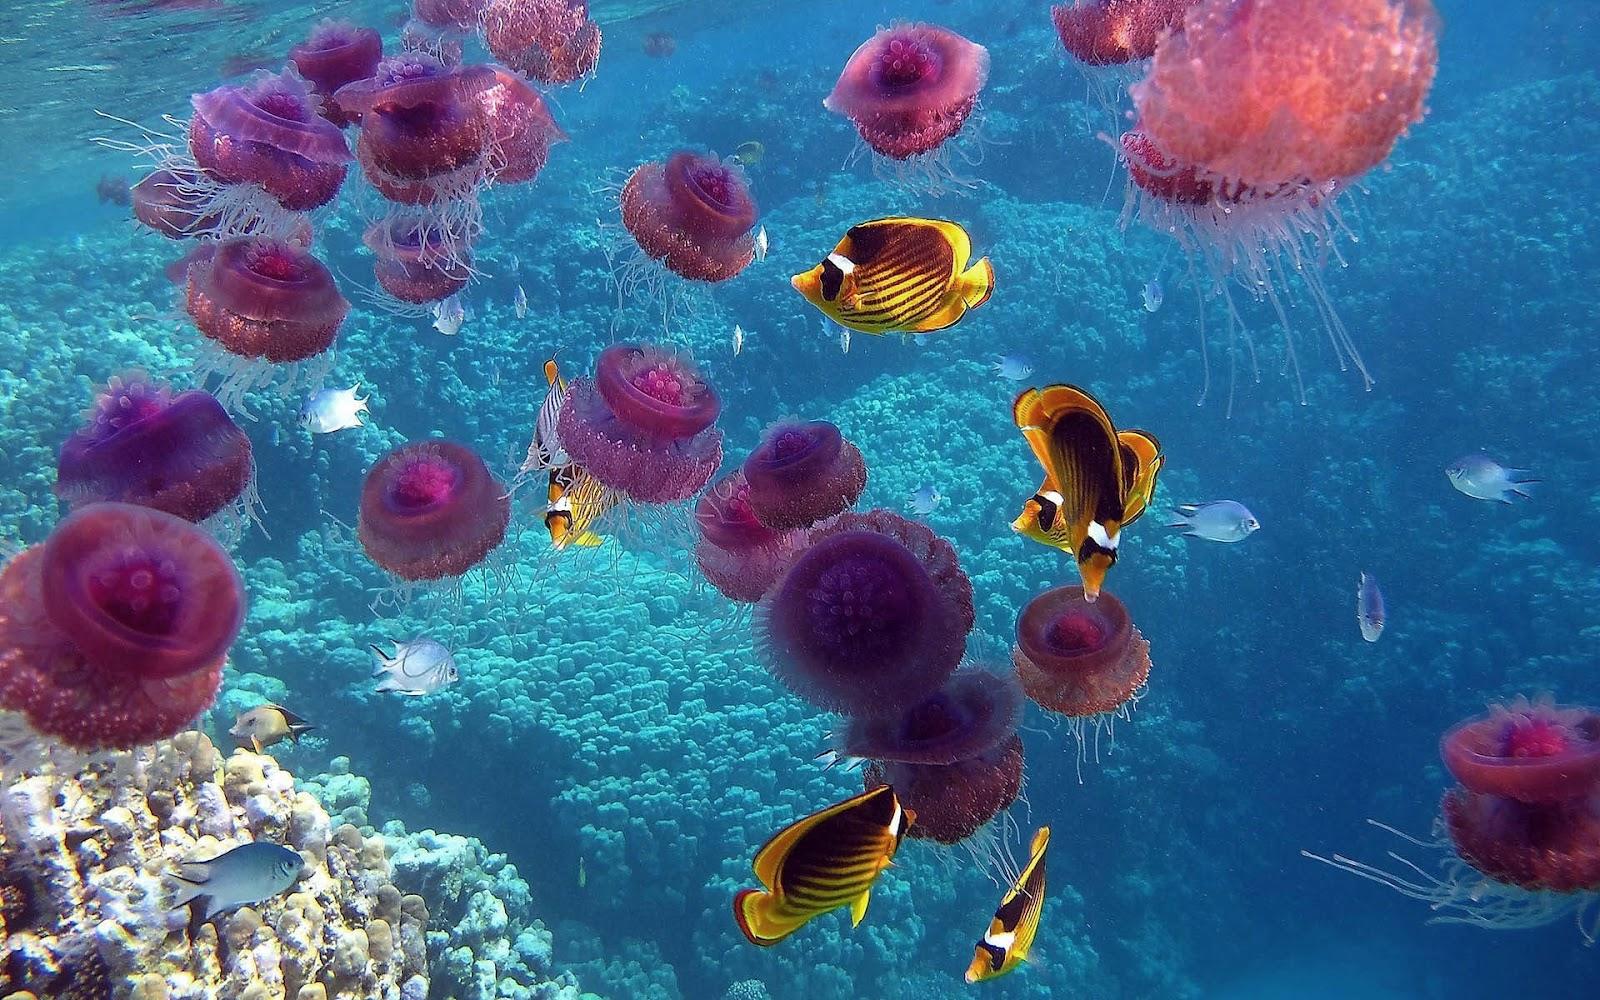 adenan hd wallpaper underwater - photo #28